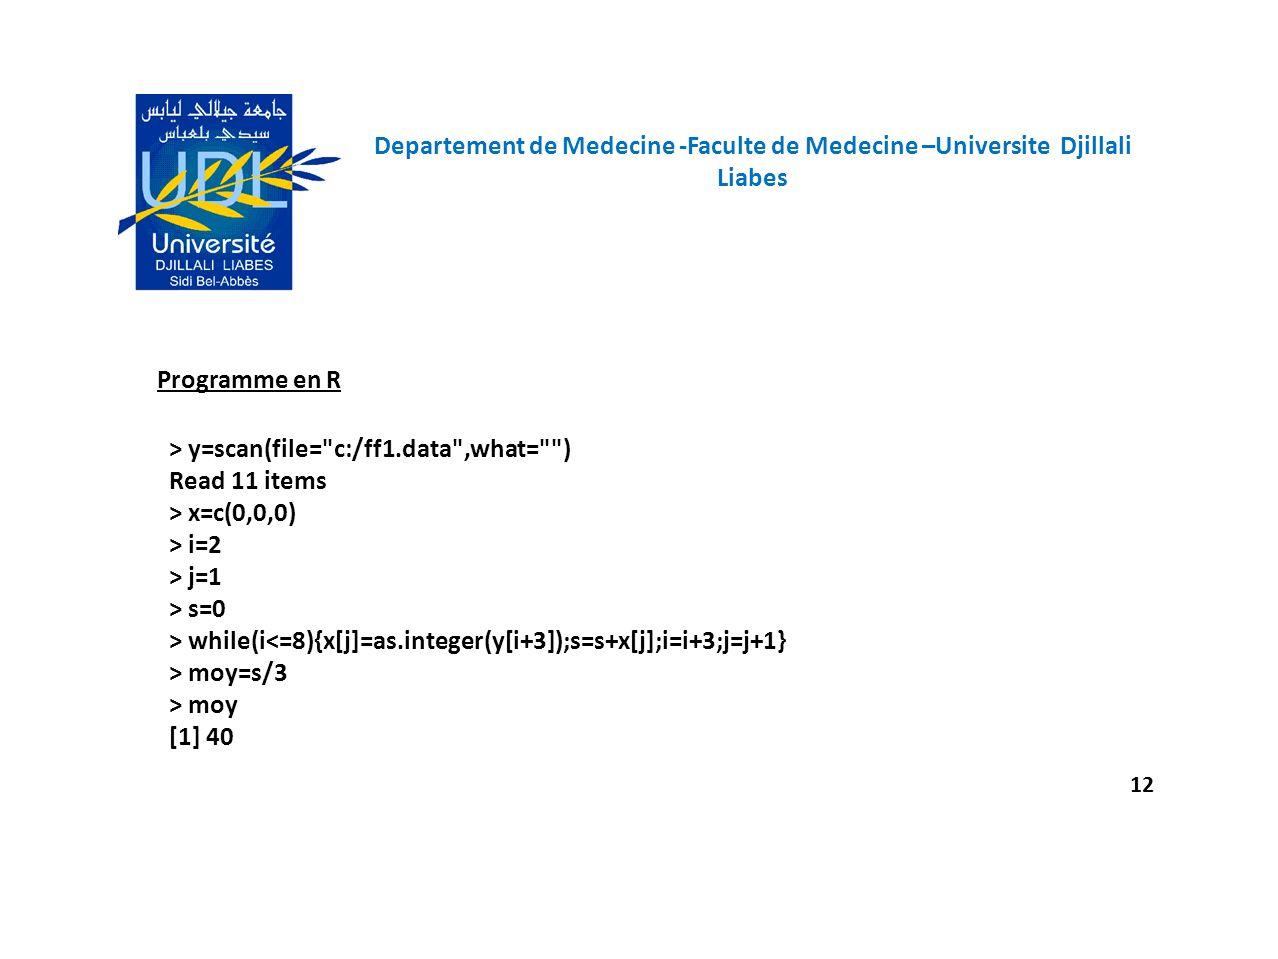 Departement de Medecine -Faculte de Medecine –Universite Djillali Liabes 12 Programme en R > y=scan(file=